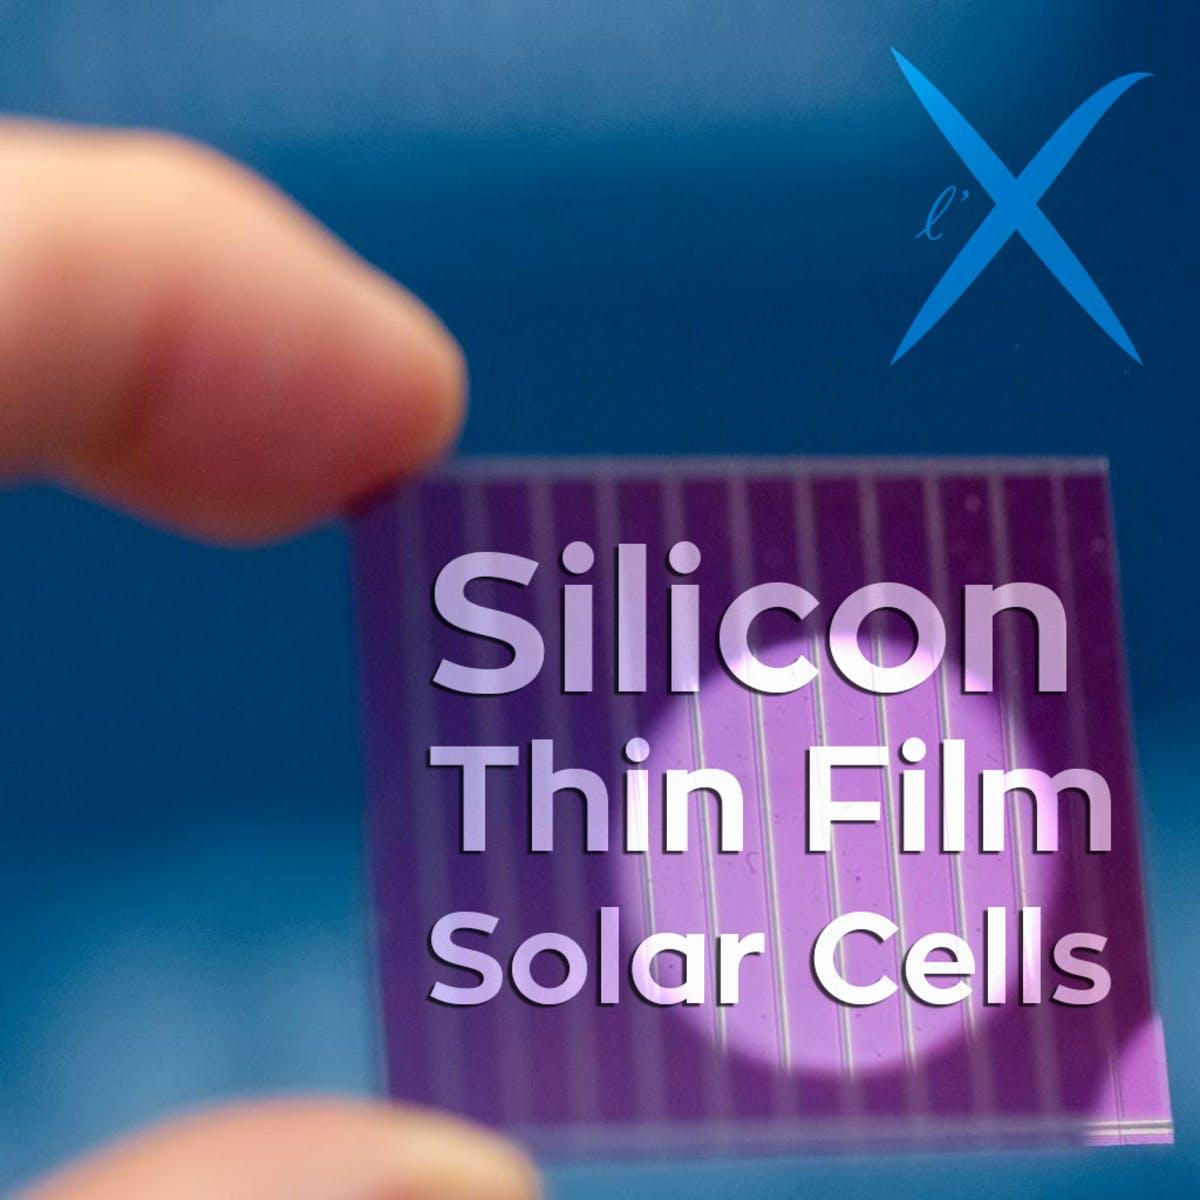 Silicon Thin Film Solar Cells